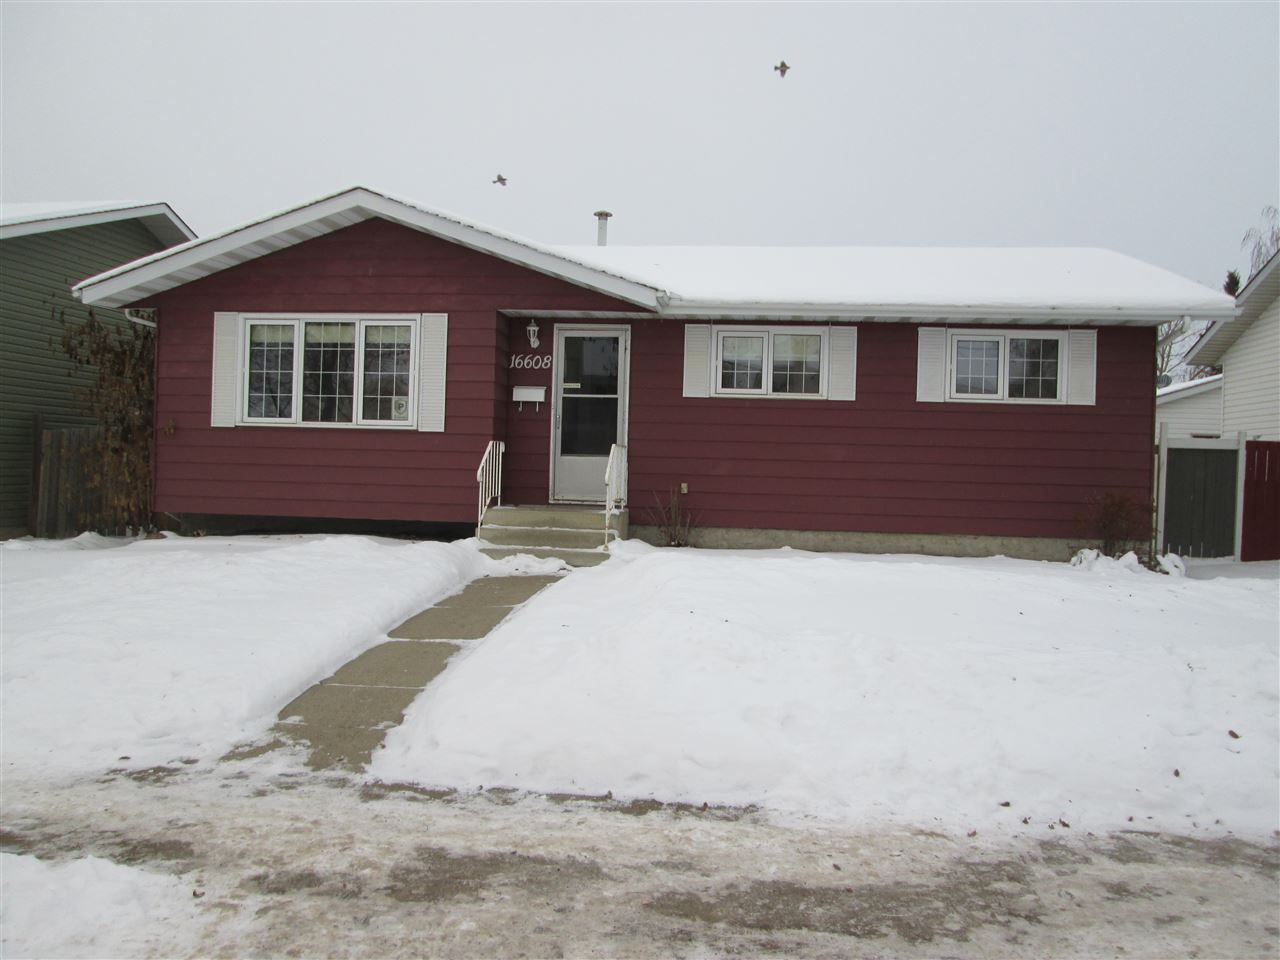 Main Photo: 16608 100 Street in Edmonton: Zone 27 House for sale : MLS®# E4138042